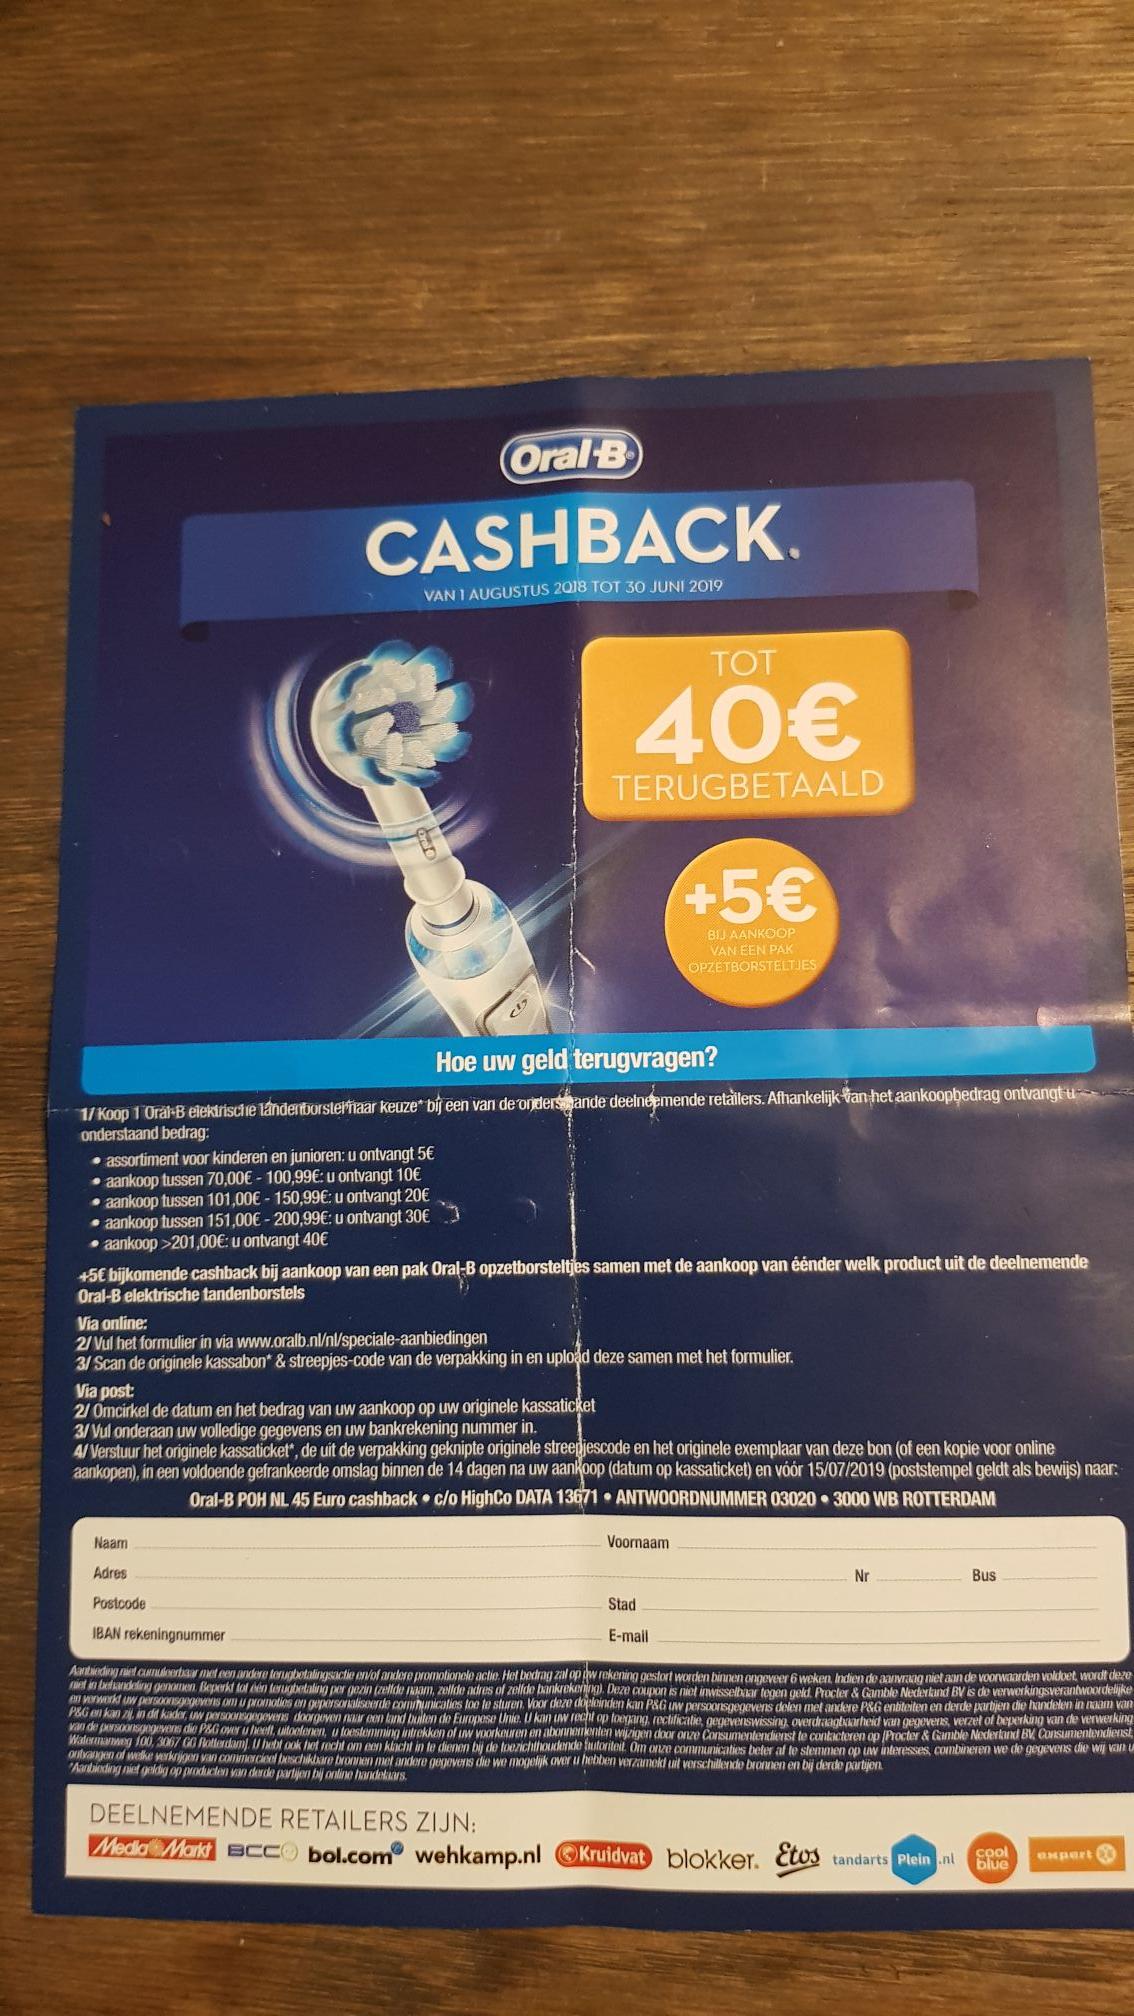 Oral-B cashback